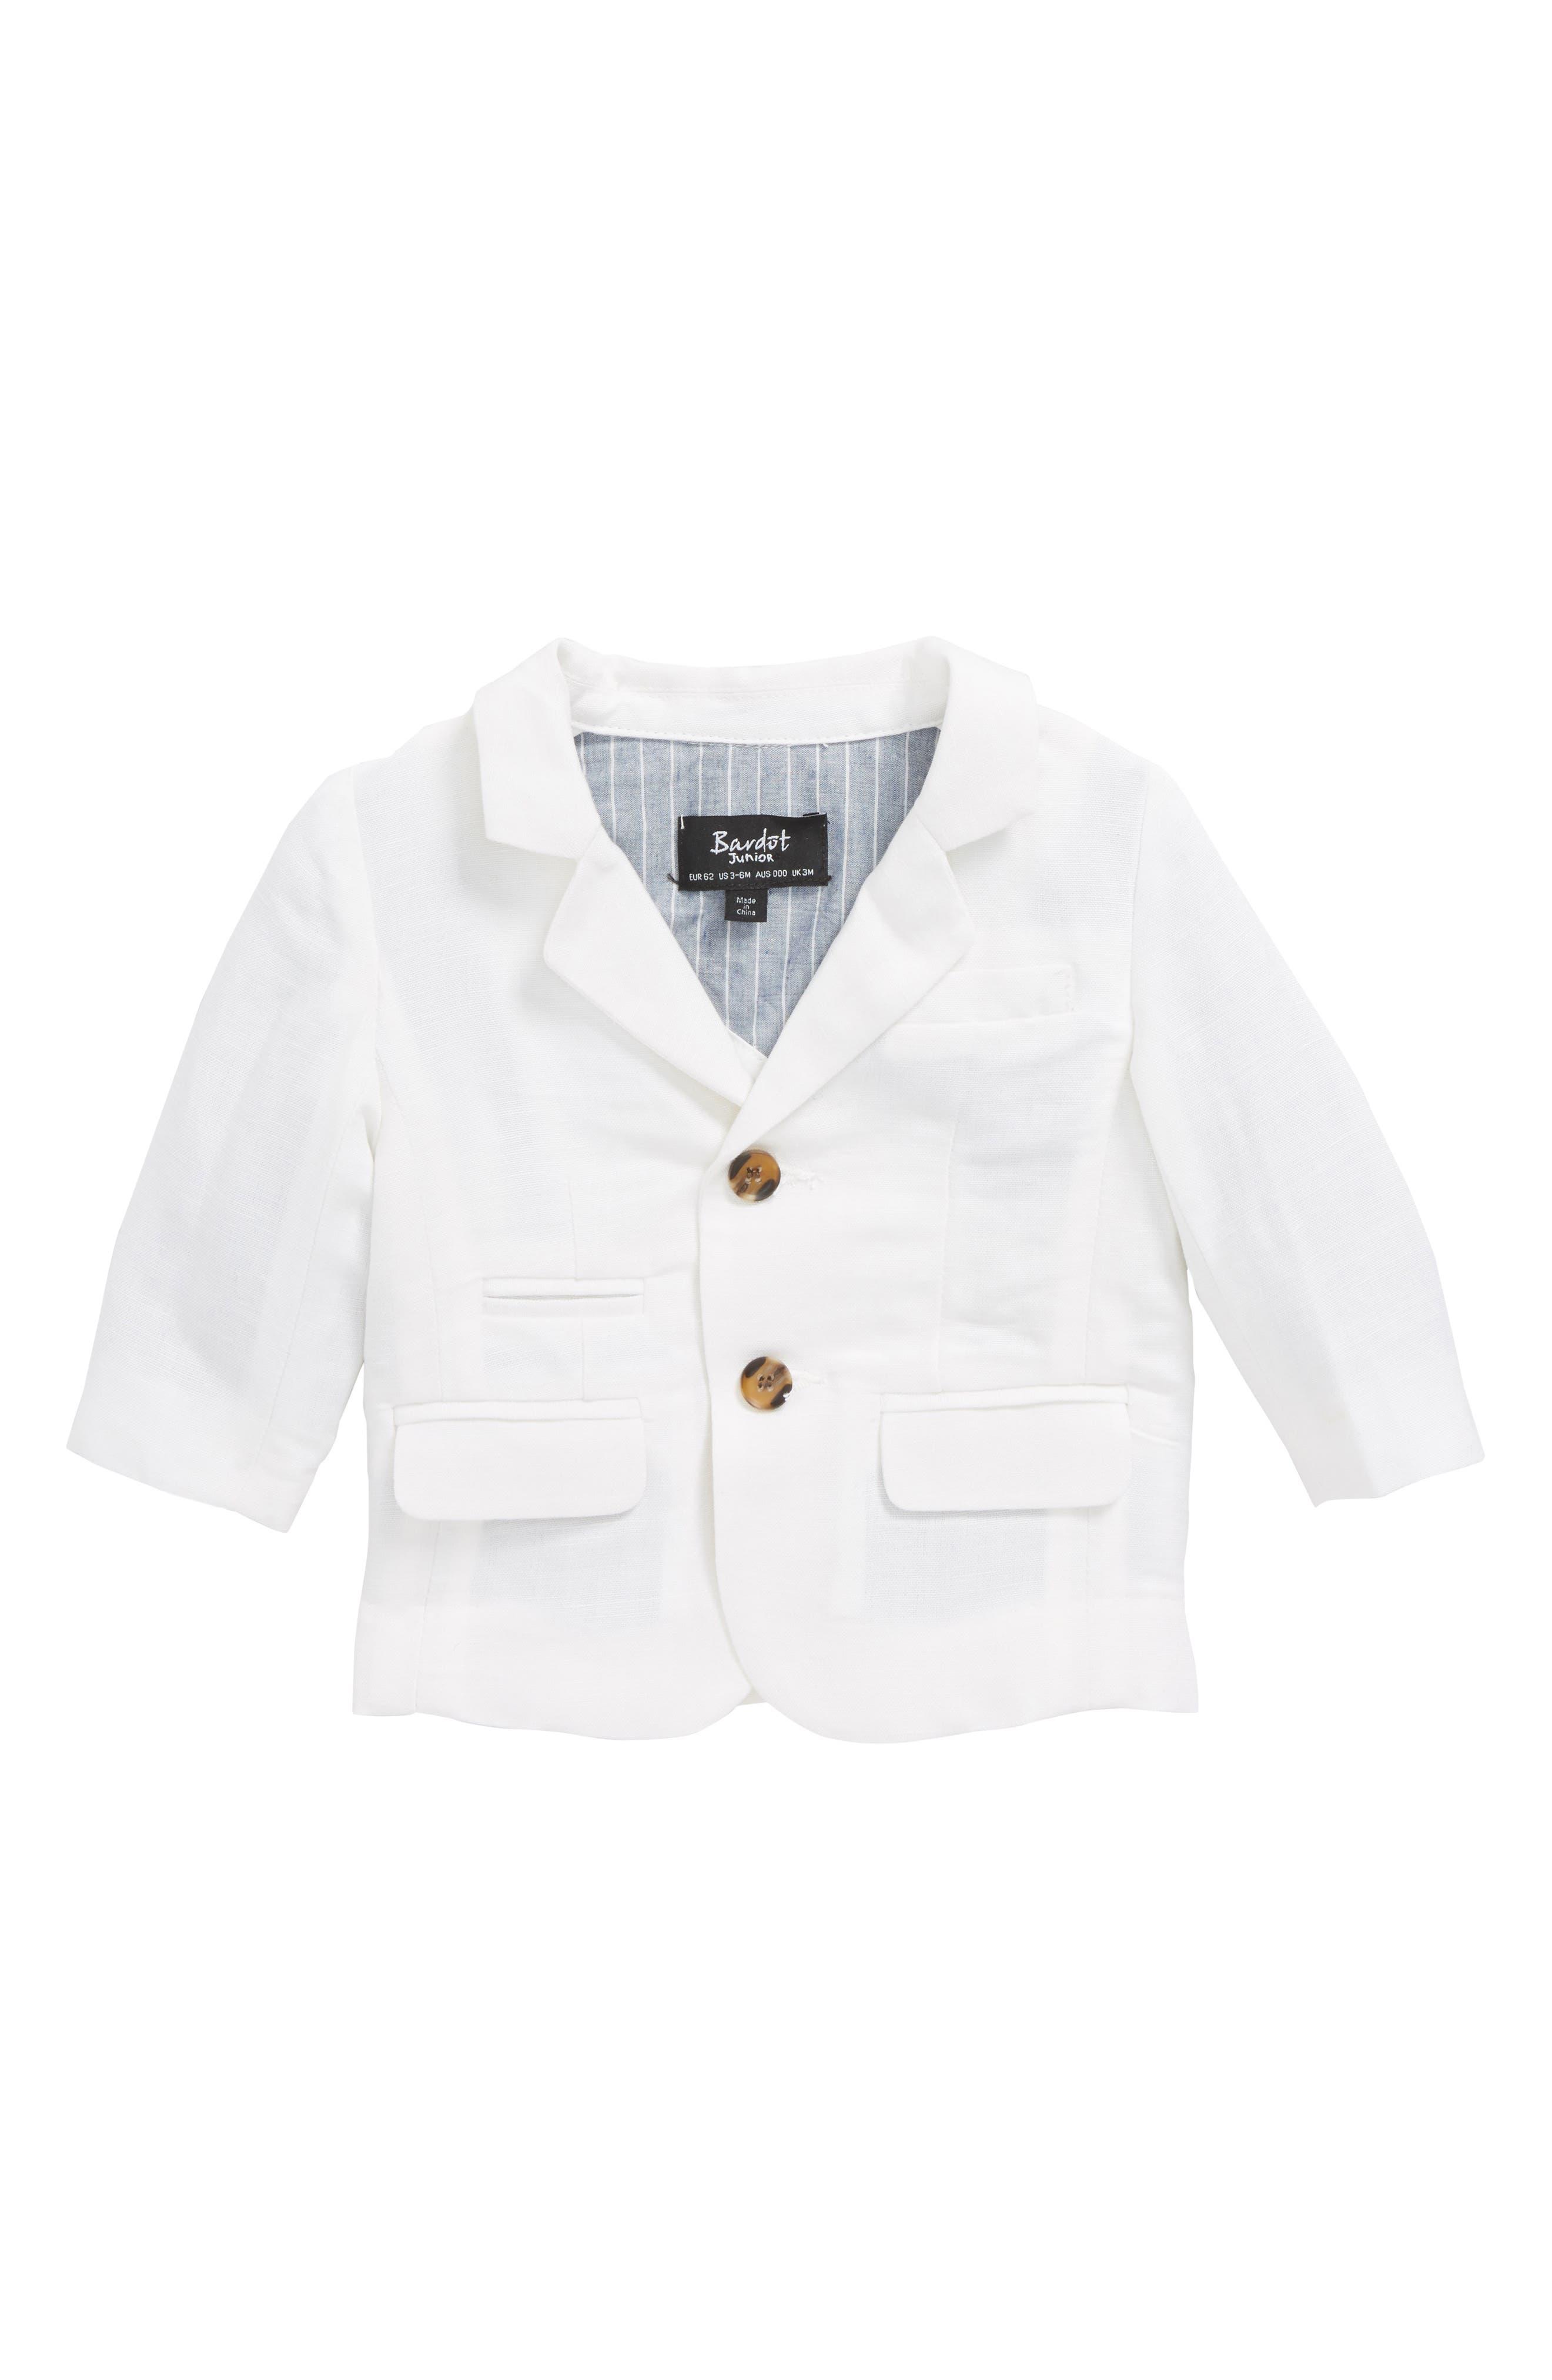 St. Tropez Linen Blend Blazer,                             Main thumbnail 1, color,                             White